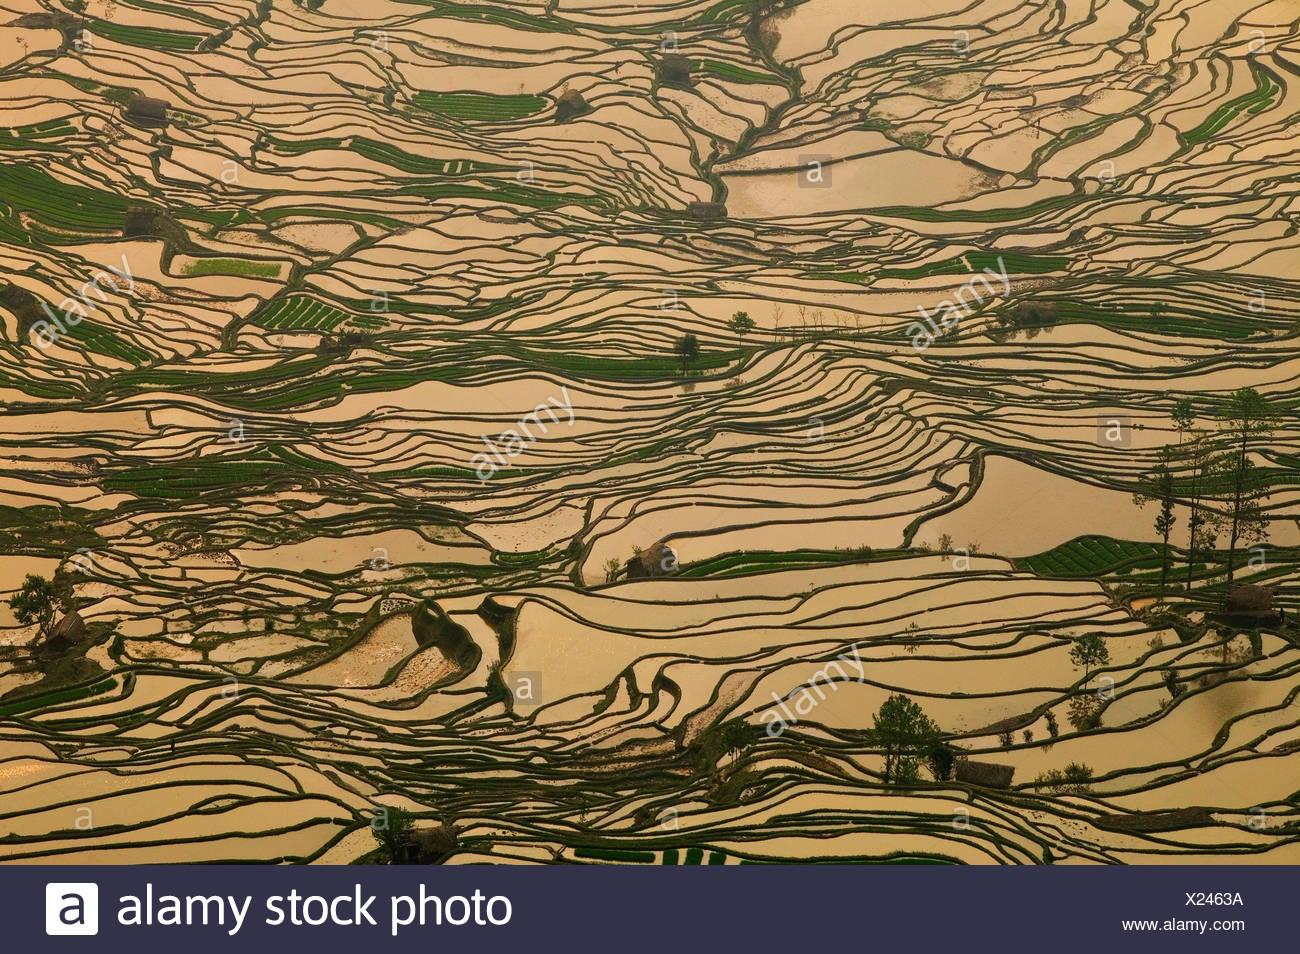 Terraced rice paddies, Yunnan Province, China - Stock Image